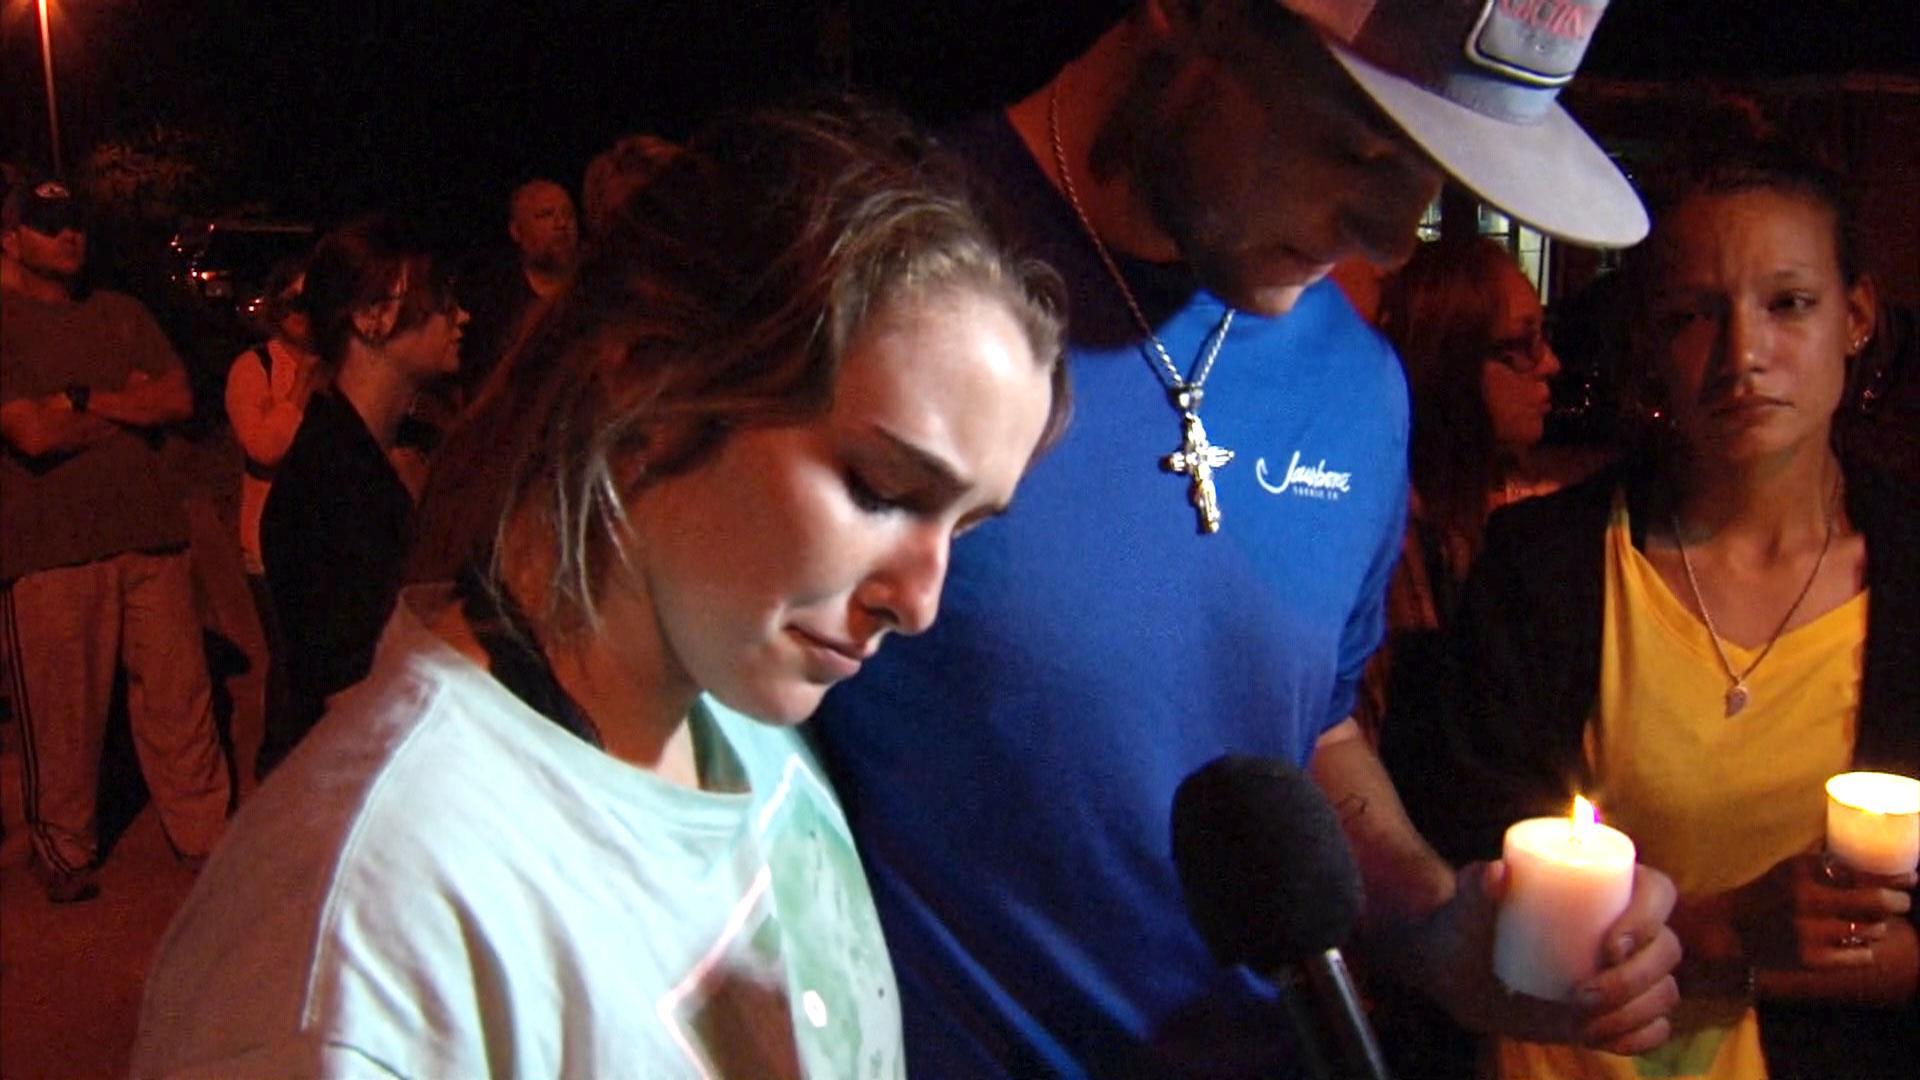 Texas Church Shooting: More Than Two Dozen Parishioners Killed